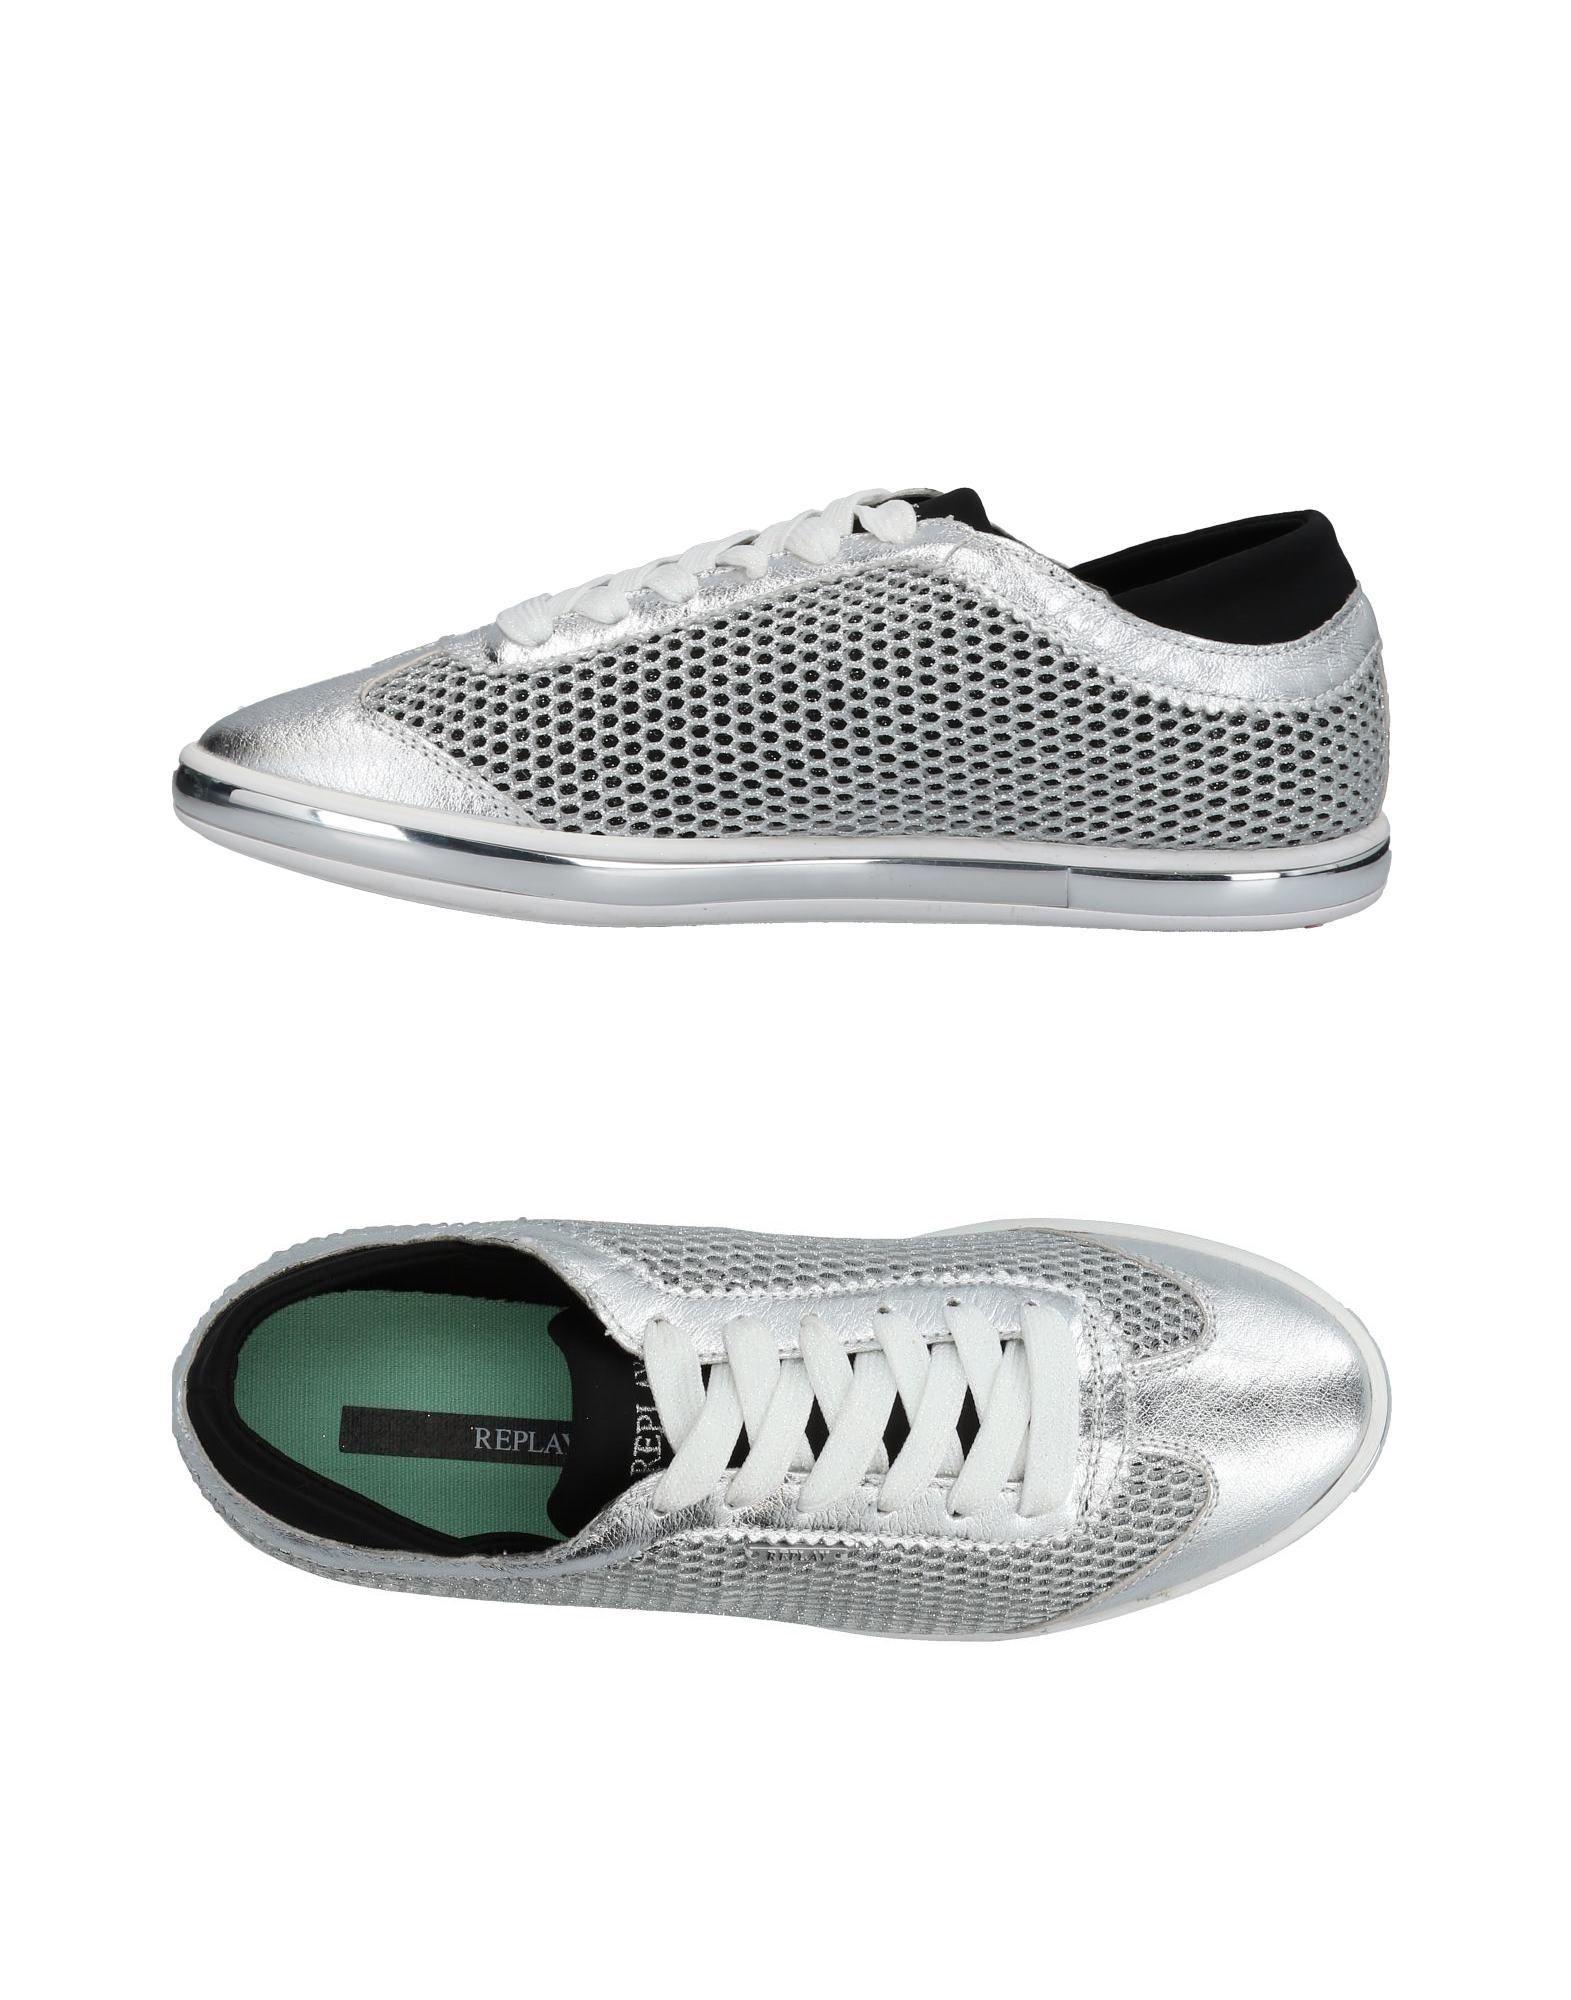 Moda Sneakers Replay Donna - 11419542VL